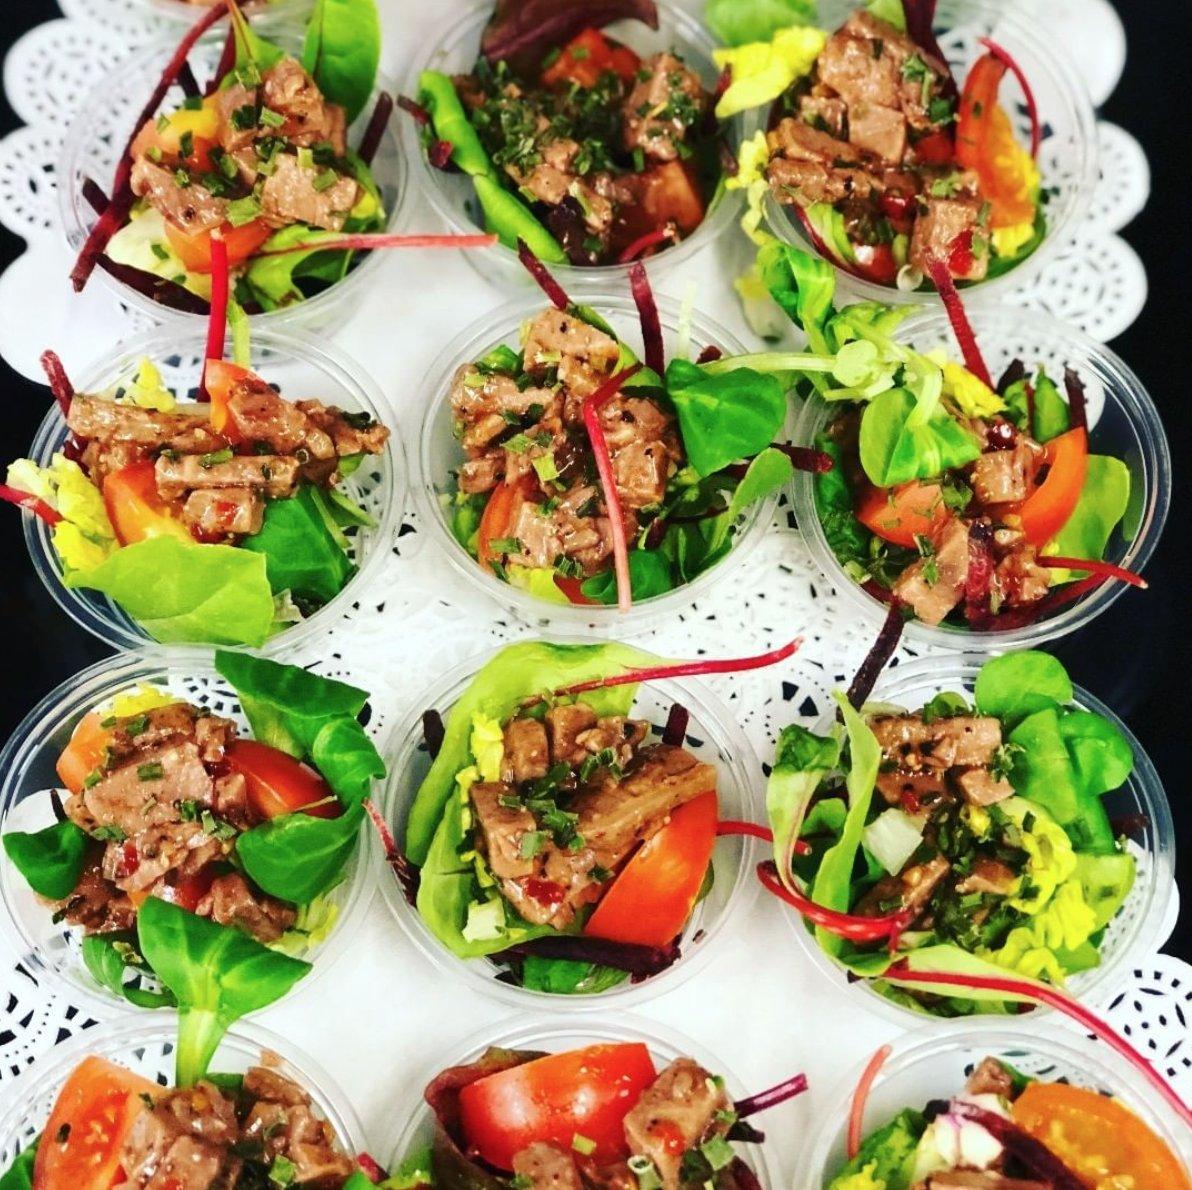 #sisterscuisine #food #foodie #partyfood #homemade #buffet #dainty #healthy #foodart #foodgasm #foody #foodporn #foodography #foodstagram #sausagerollsfordays #yummy #nottingham #mansfield #blidworth #derby #london #leicester #manchester #birmingham #liverpool #sheffield